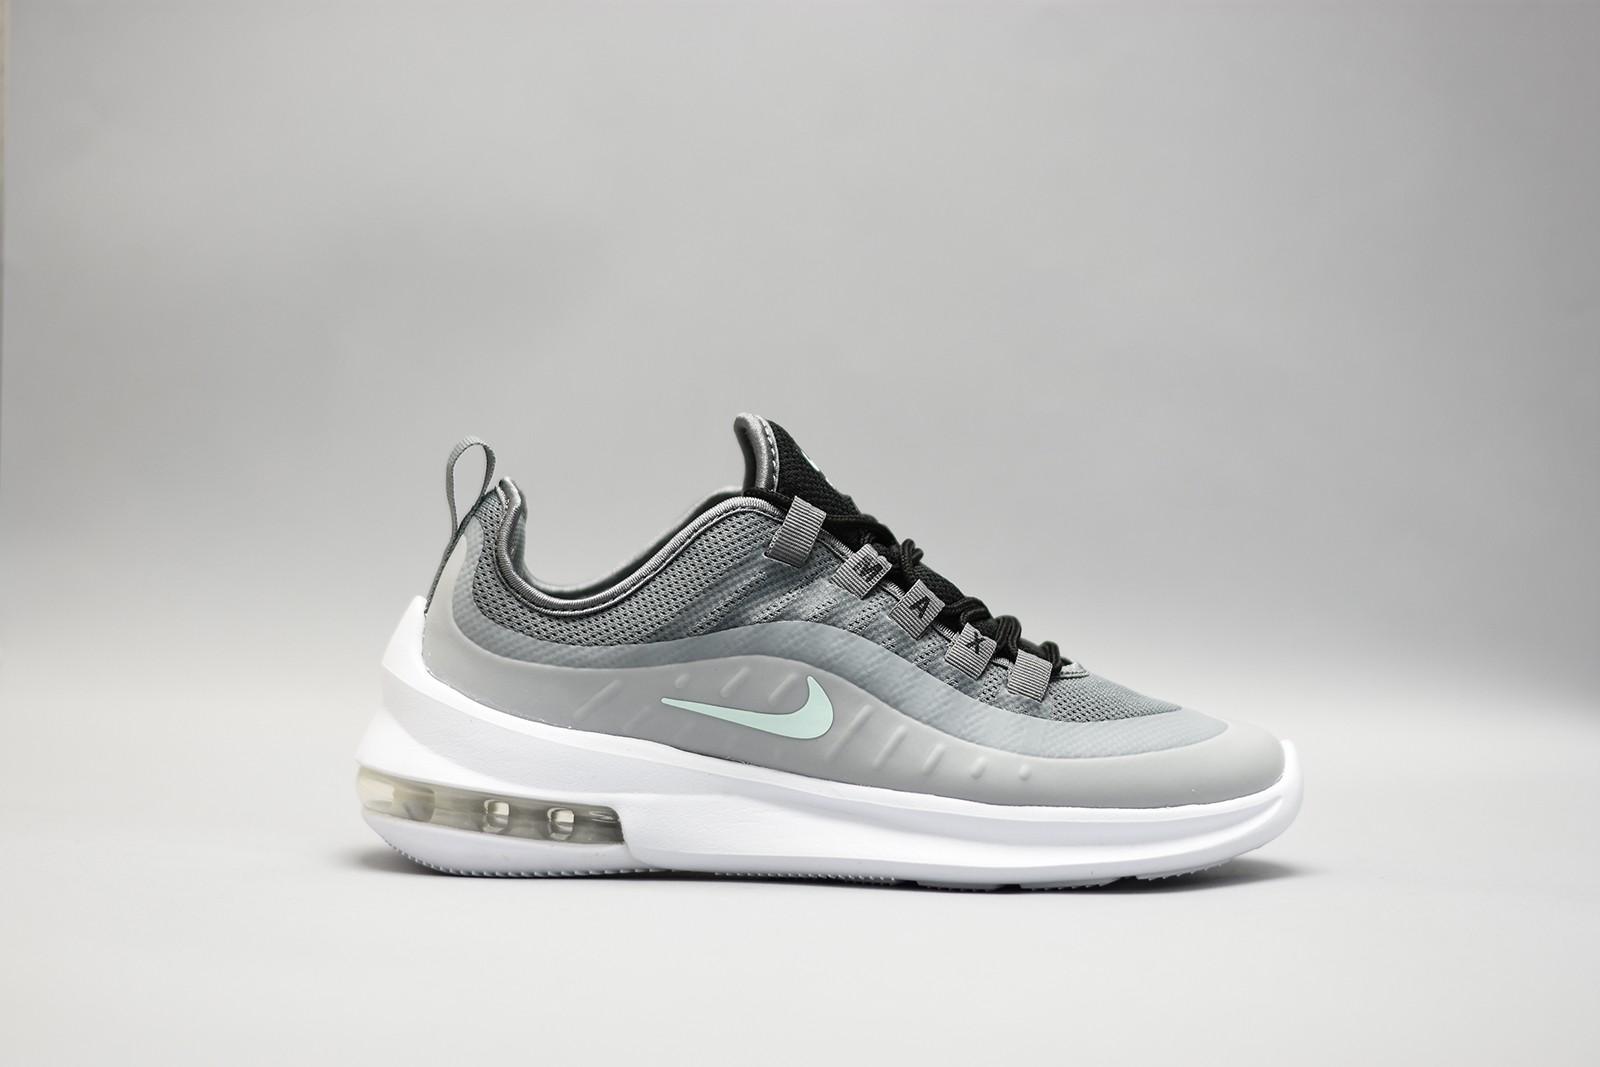 Dámské Tenisky Nike WMNS AIR MAX AXIS  79c8b92275b